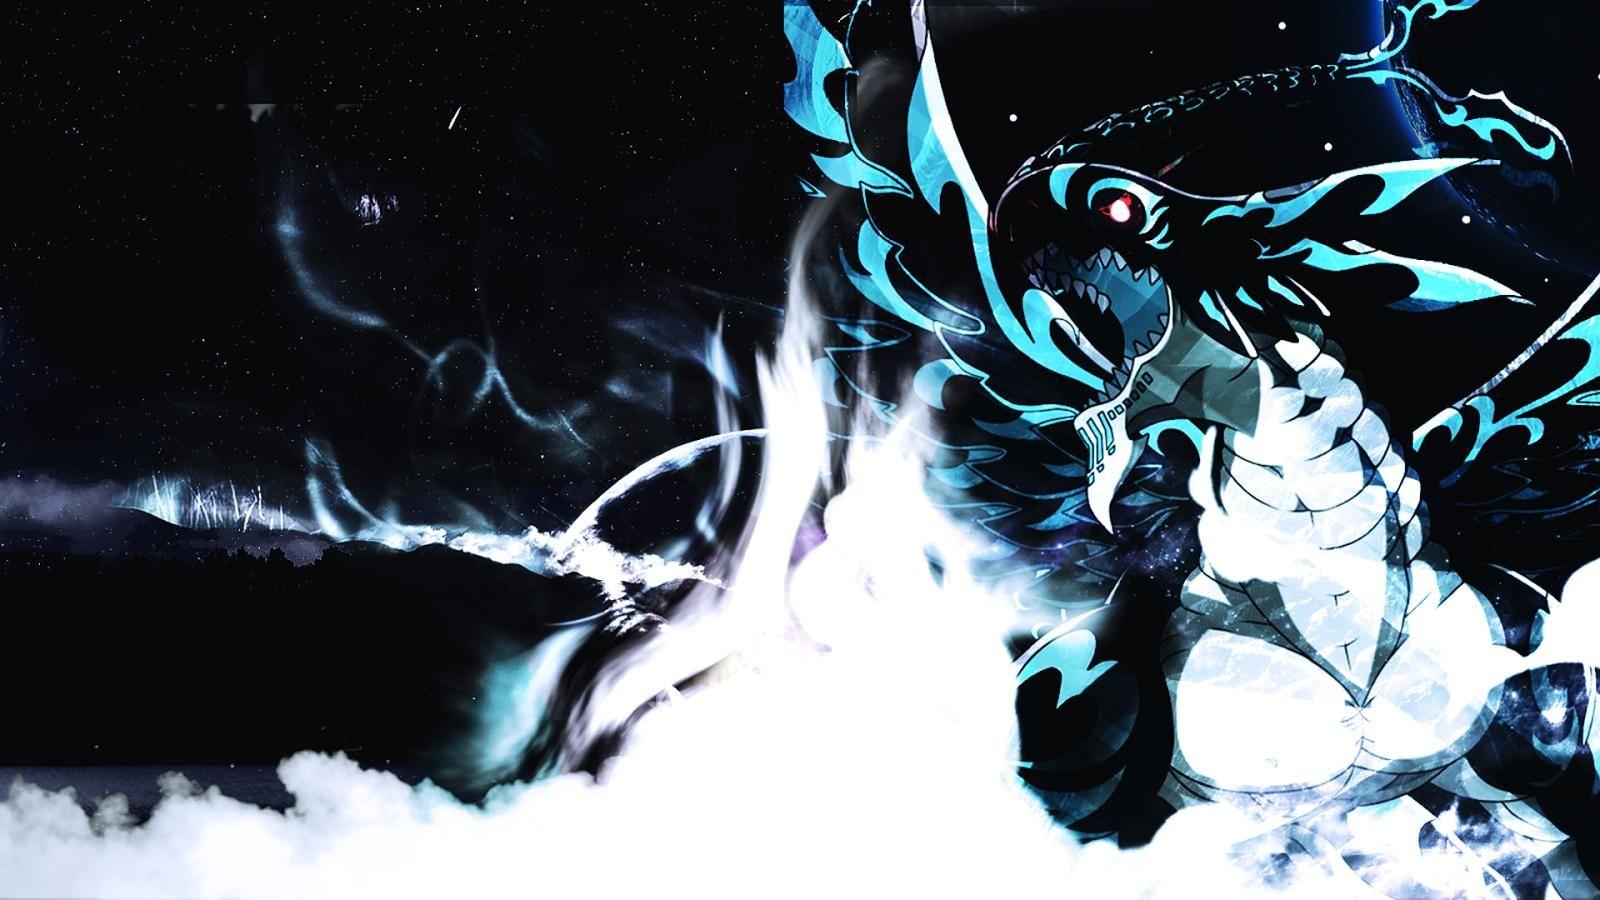 Acnologia Dragon 1244 Hd Wallpaper Anime Dragoes